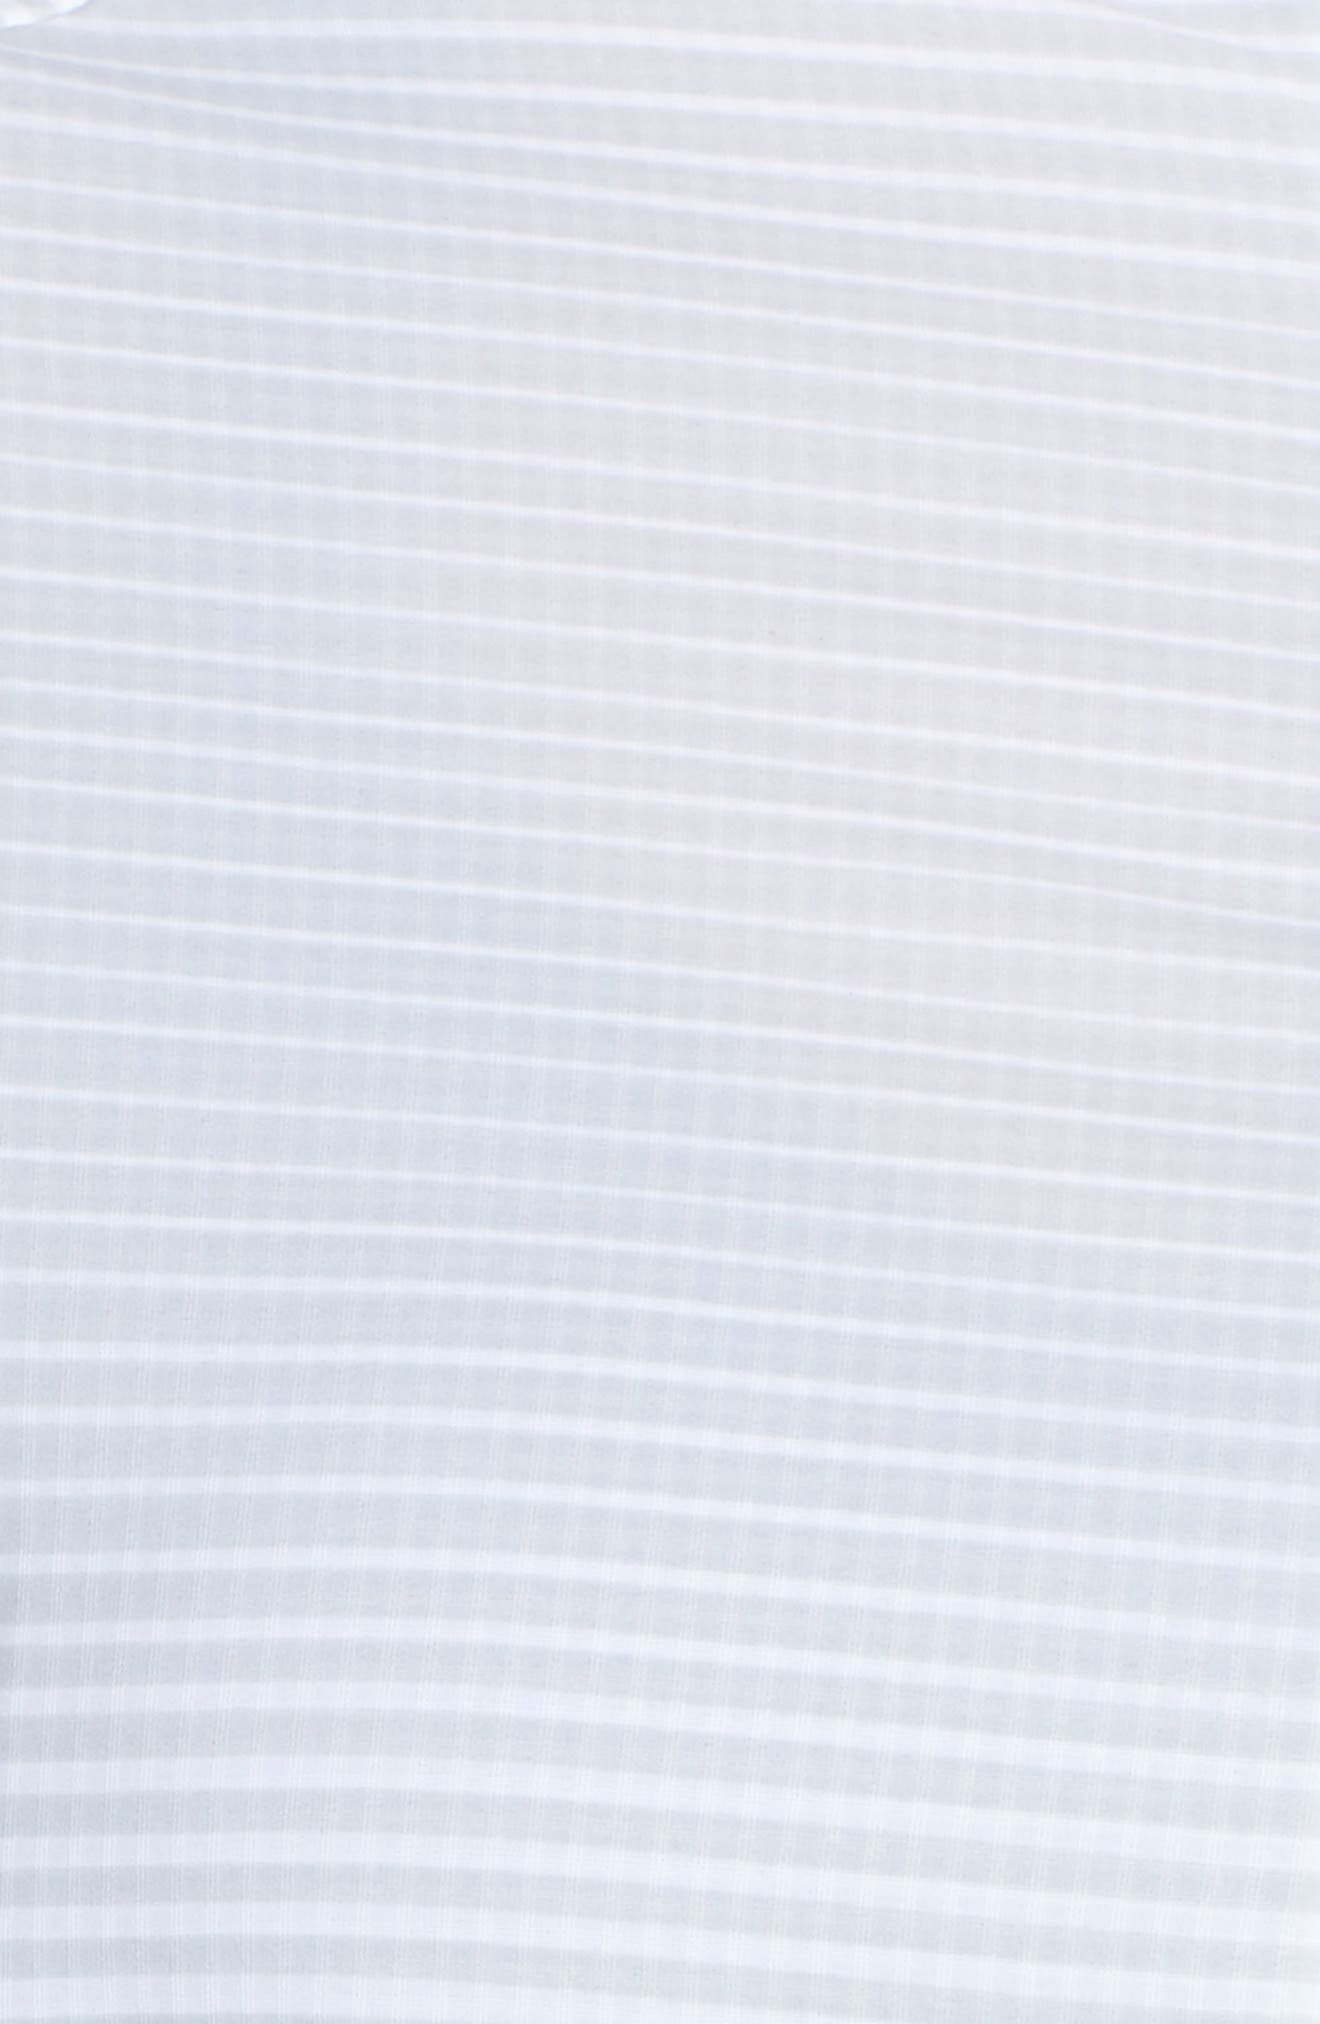 BROOKS, Canopy SE Reflective Running Jacket, Alternate thumbnail 7, color, 406